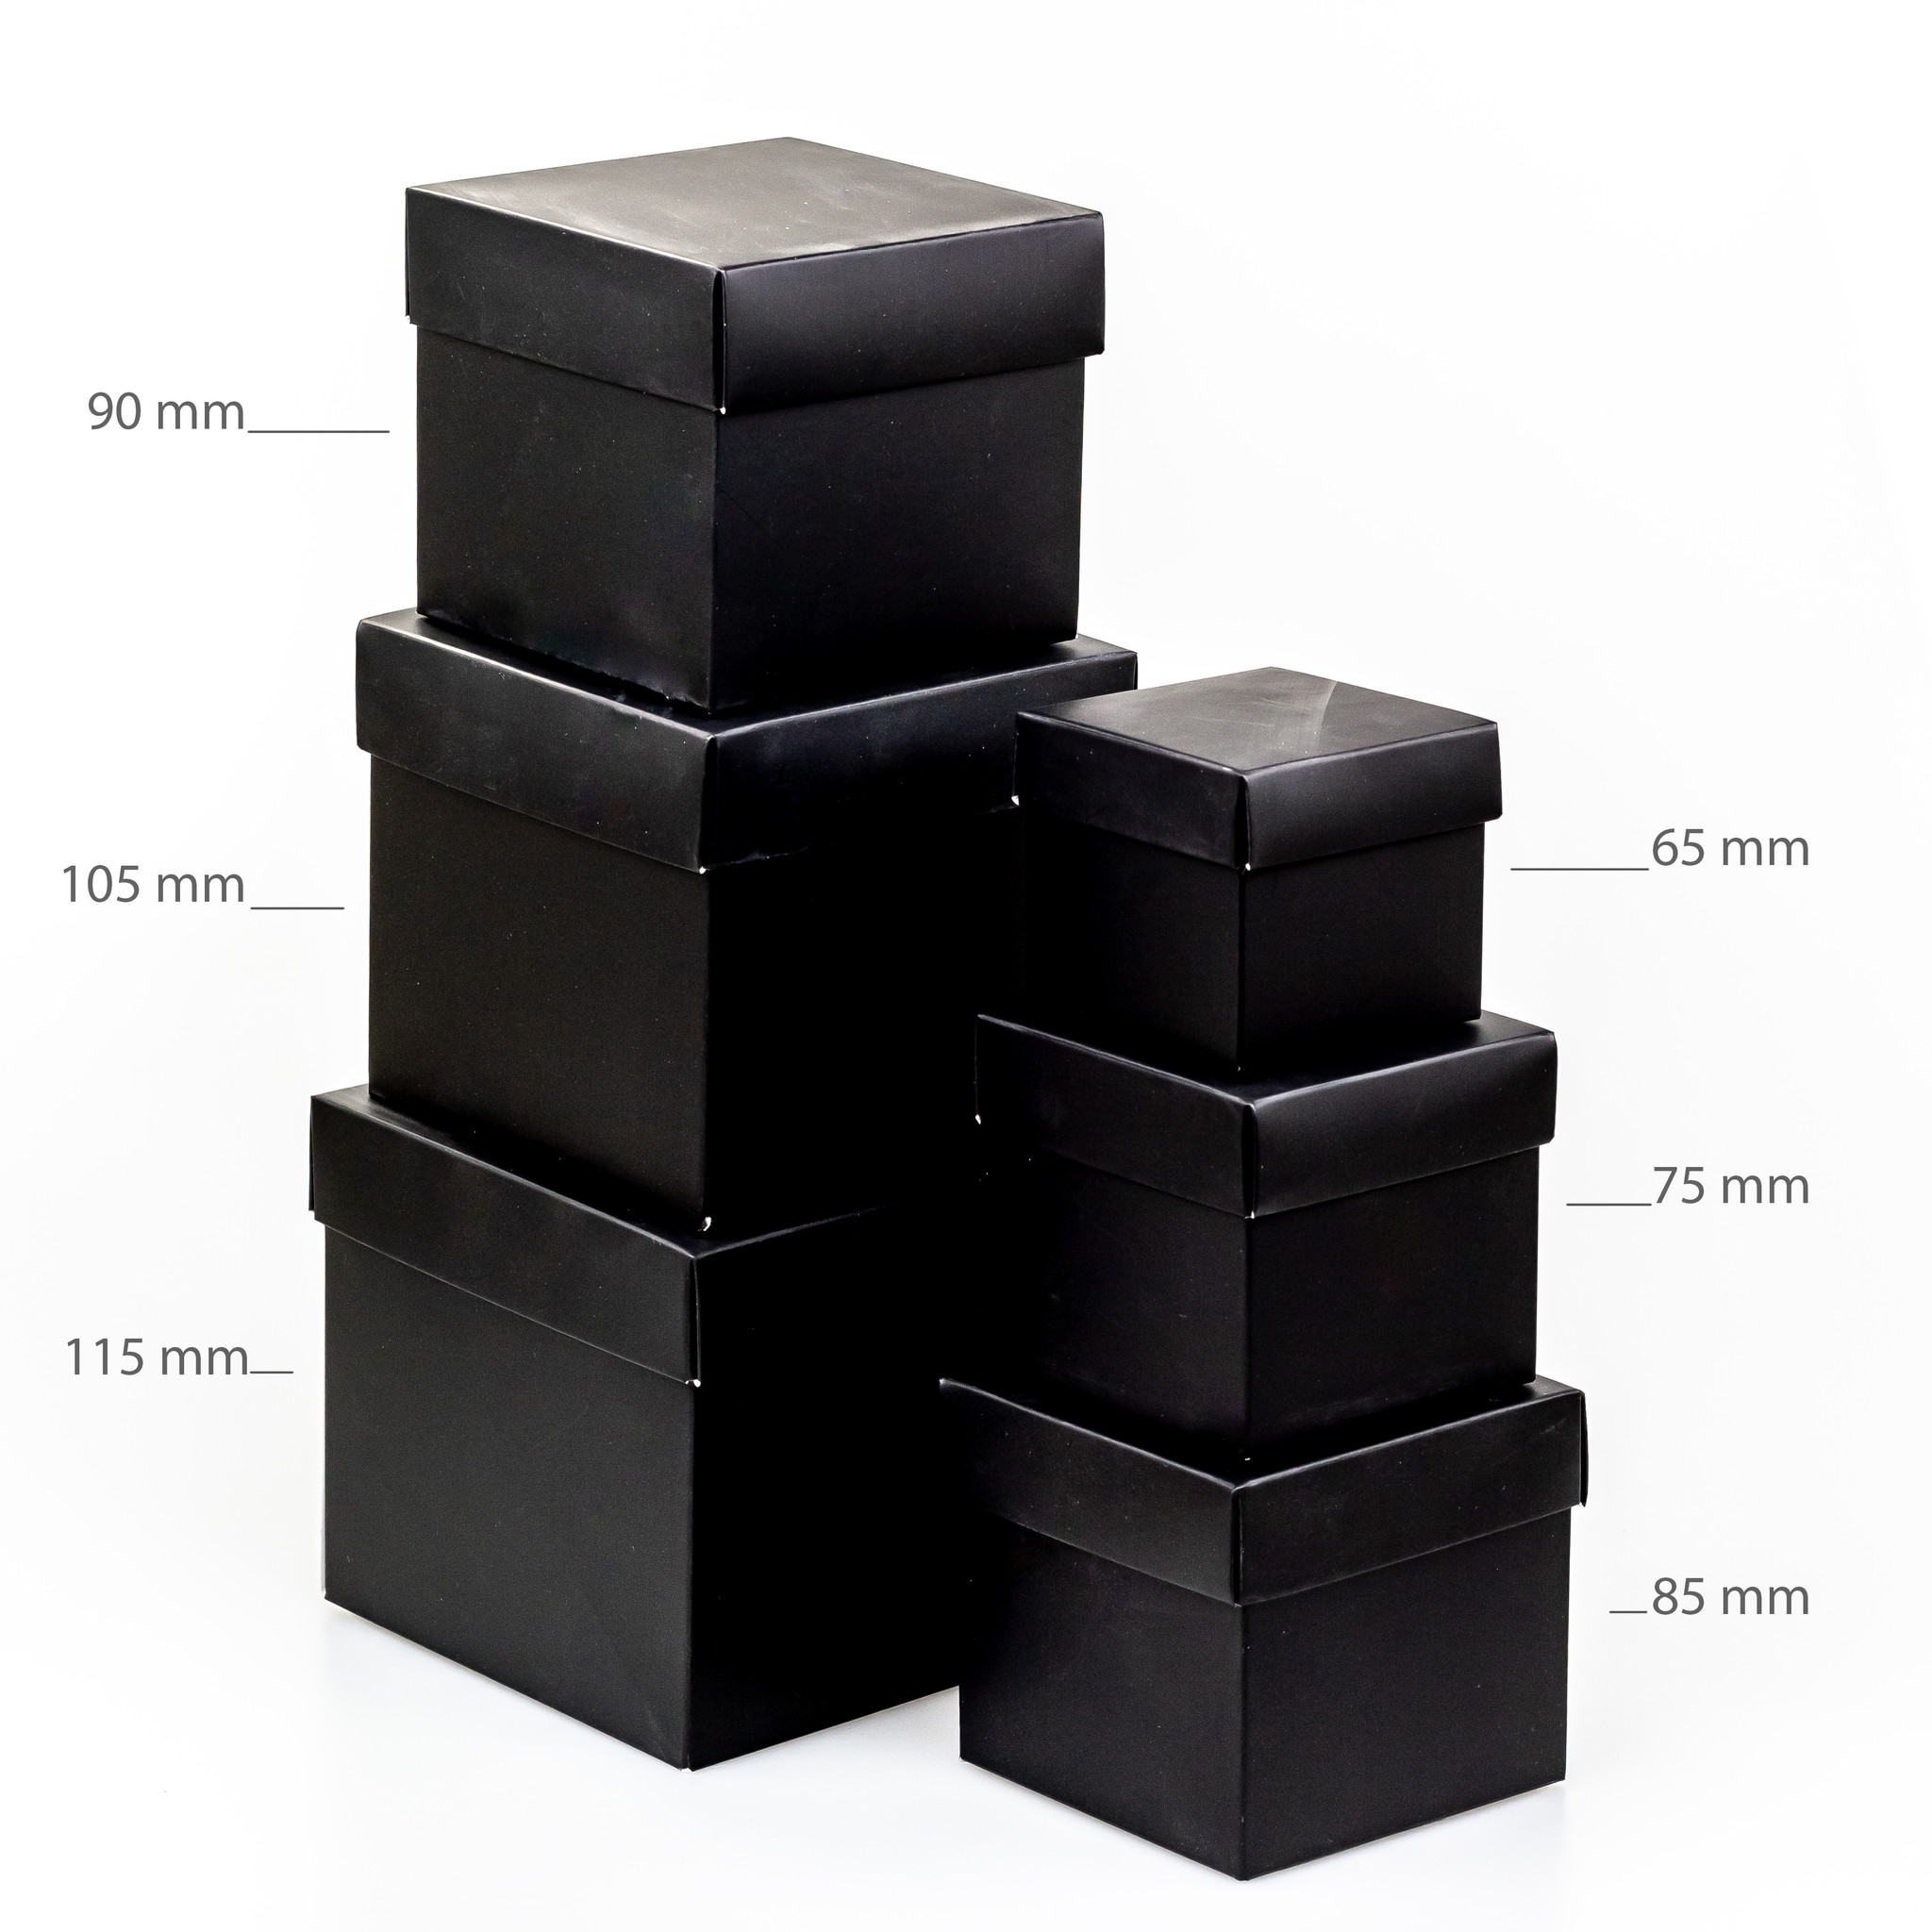 Cubebox - Minzgrün